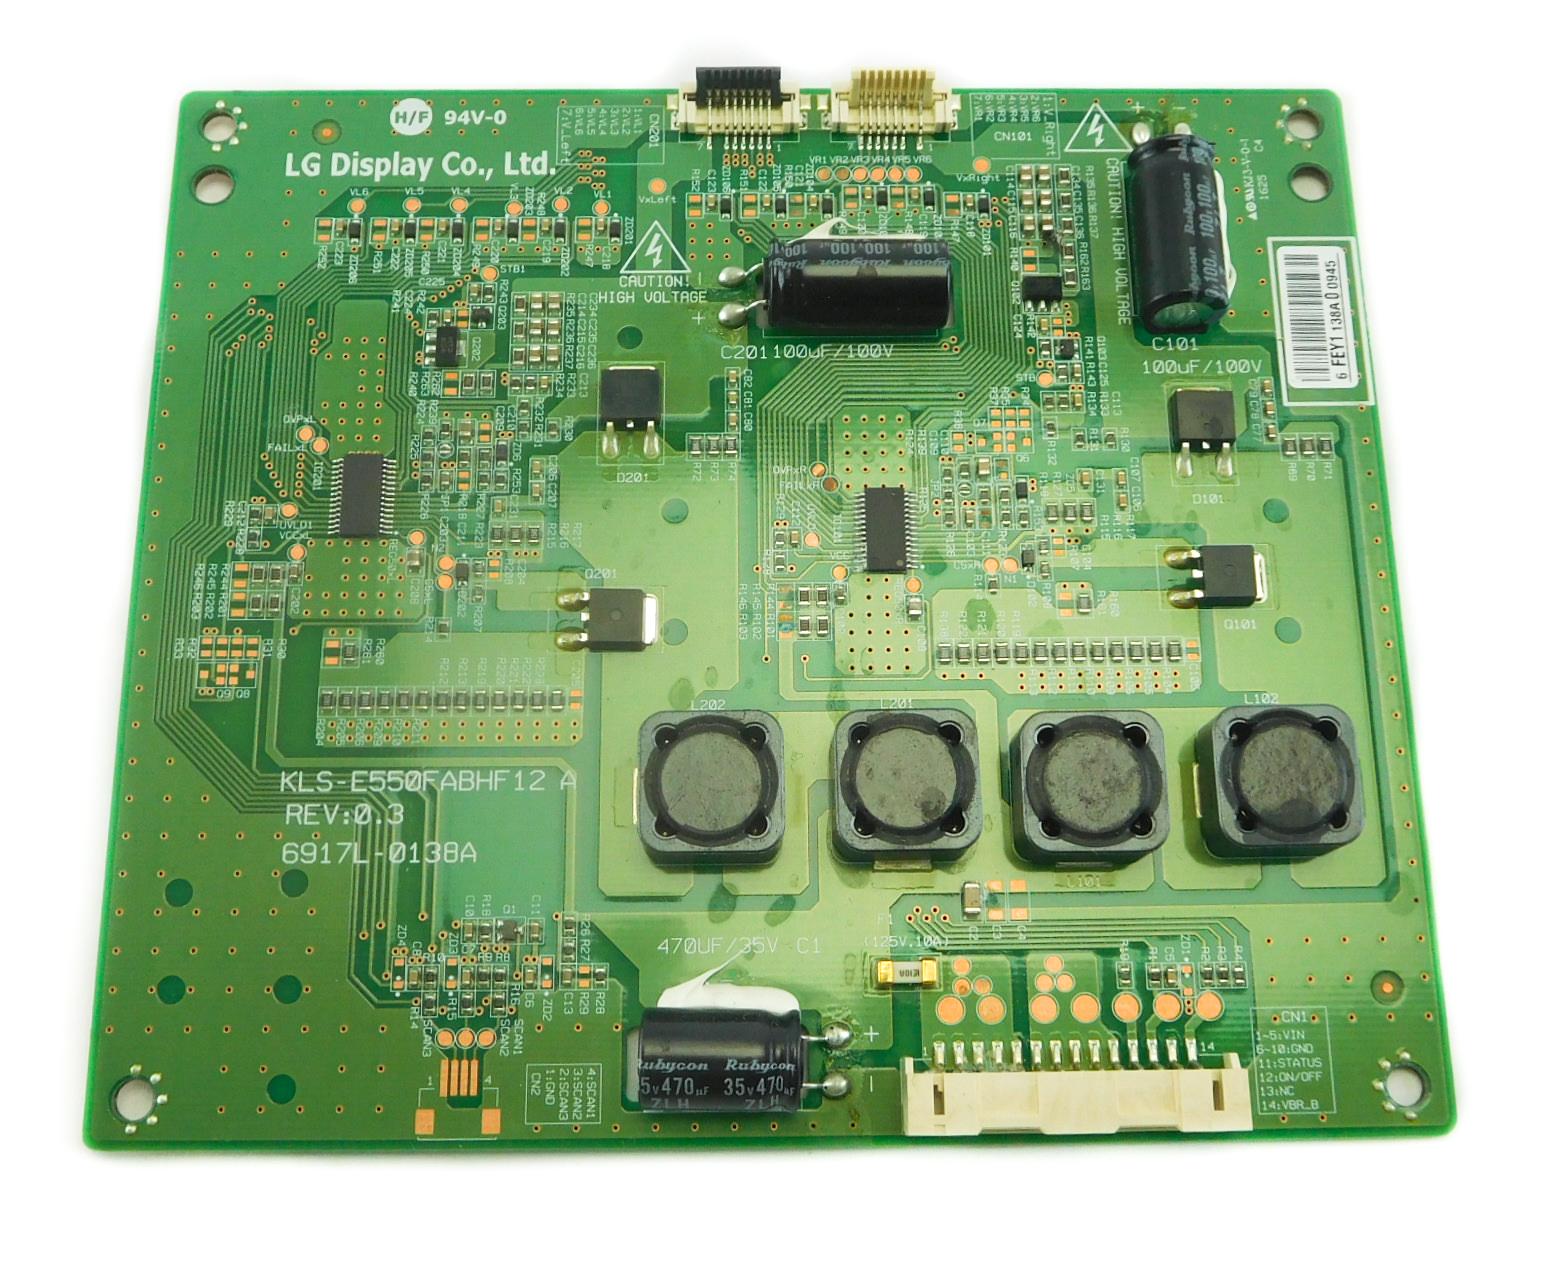 LG Display KLS-E550FABHF12 A 6917L-0138A Inverter Board